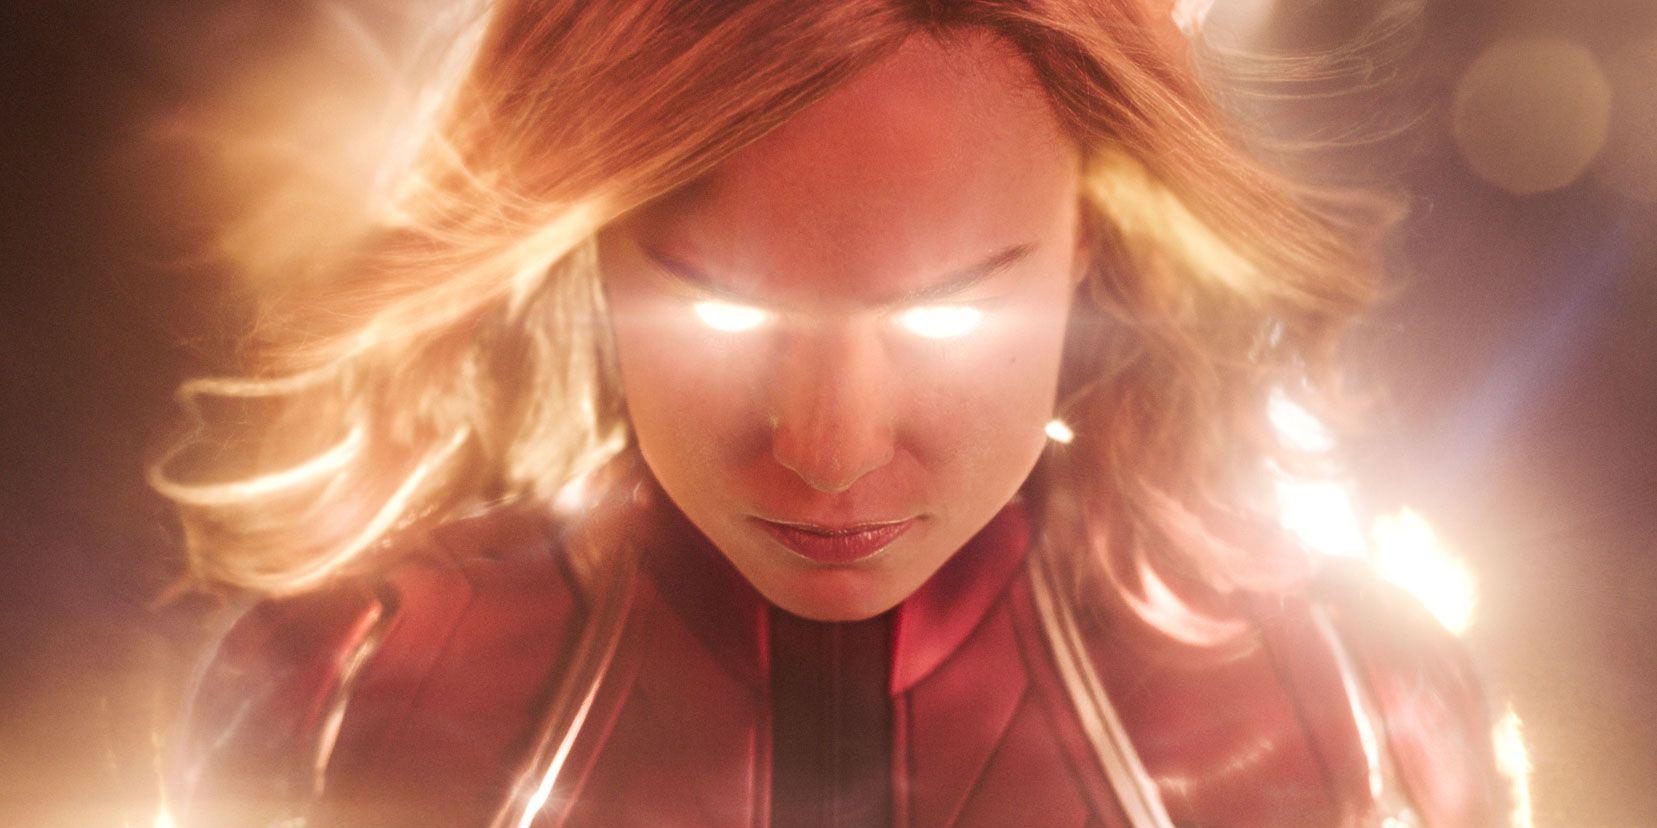 Brie Larson alias Carole Danvers aka captain marvel